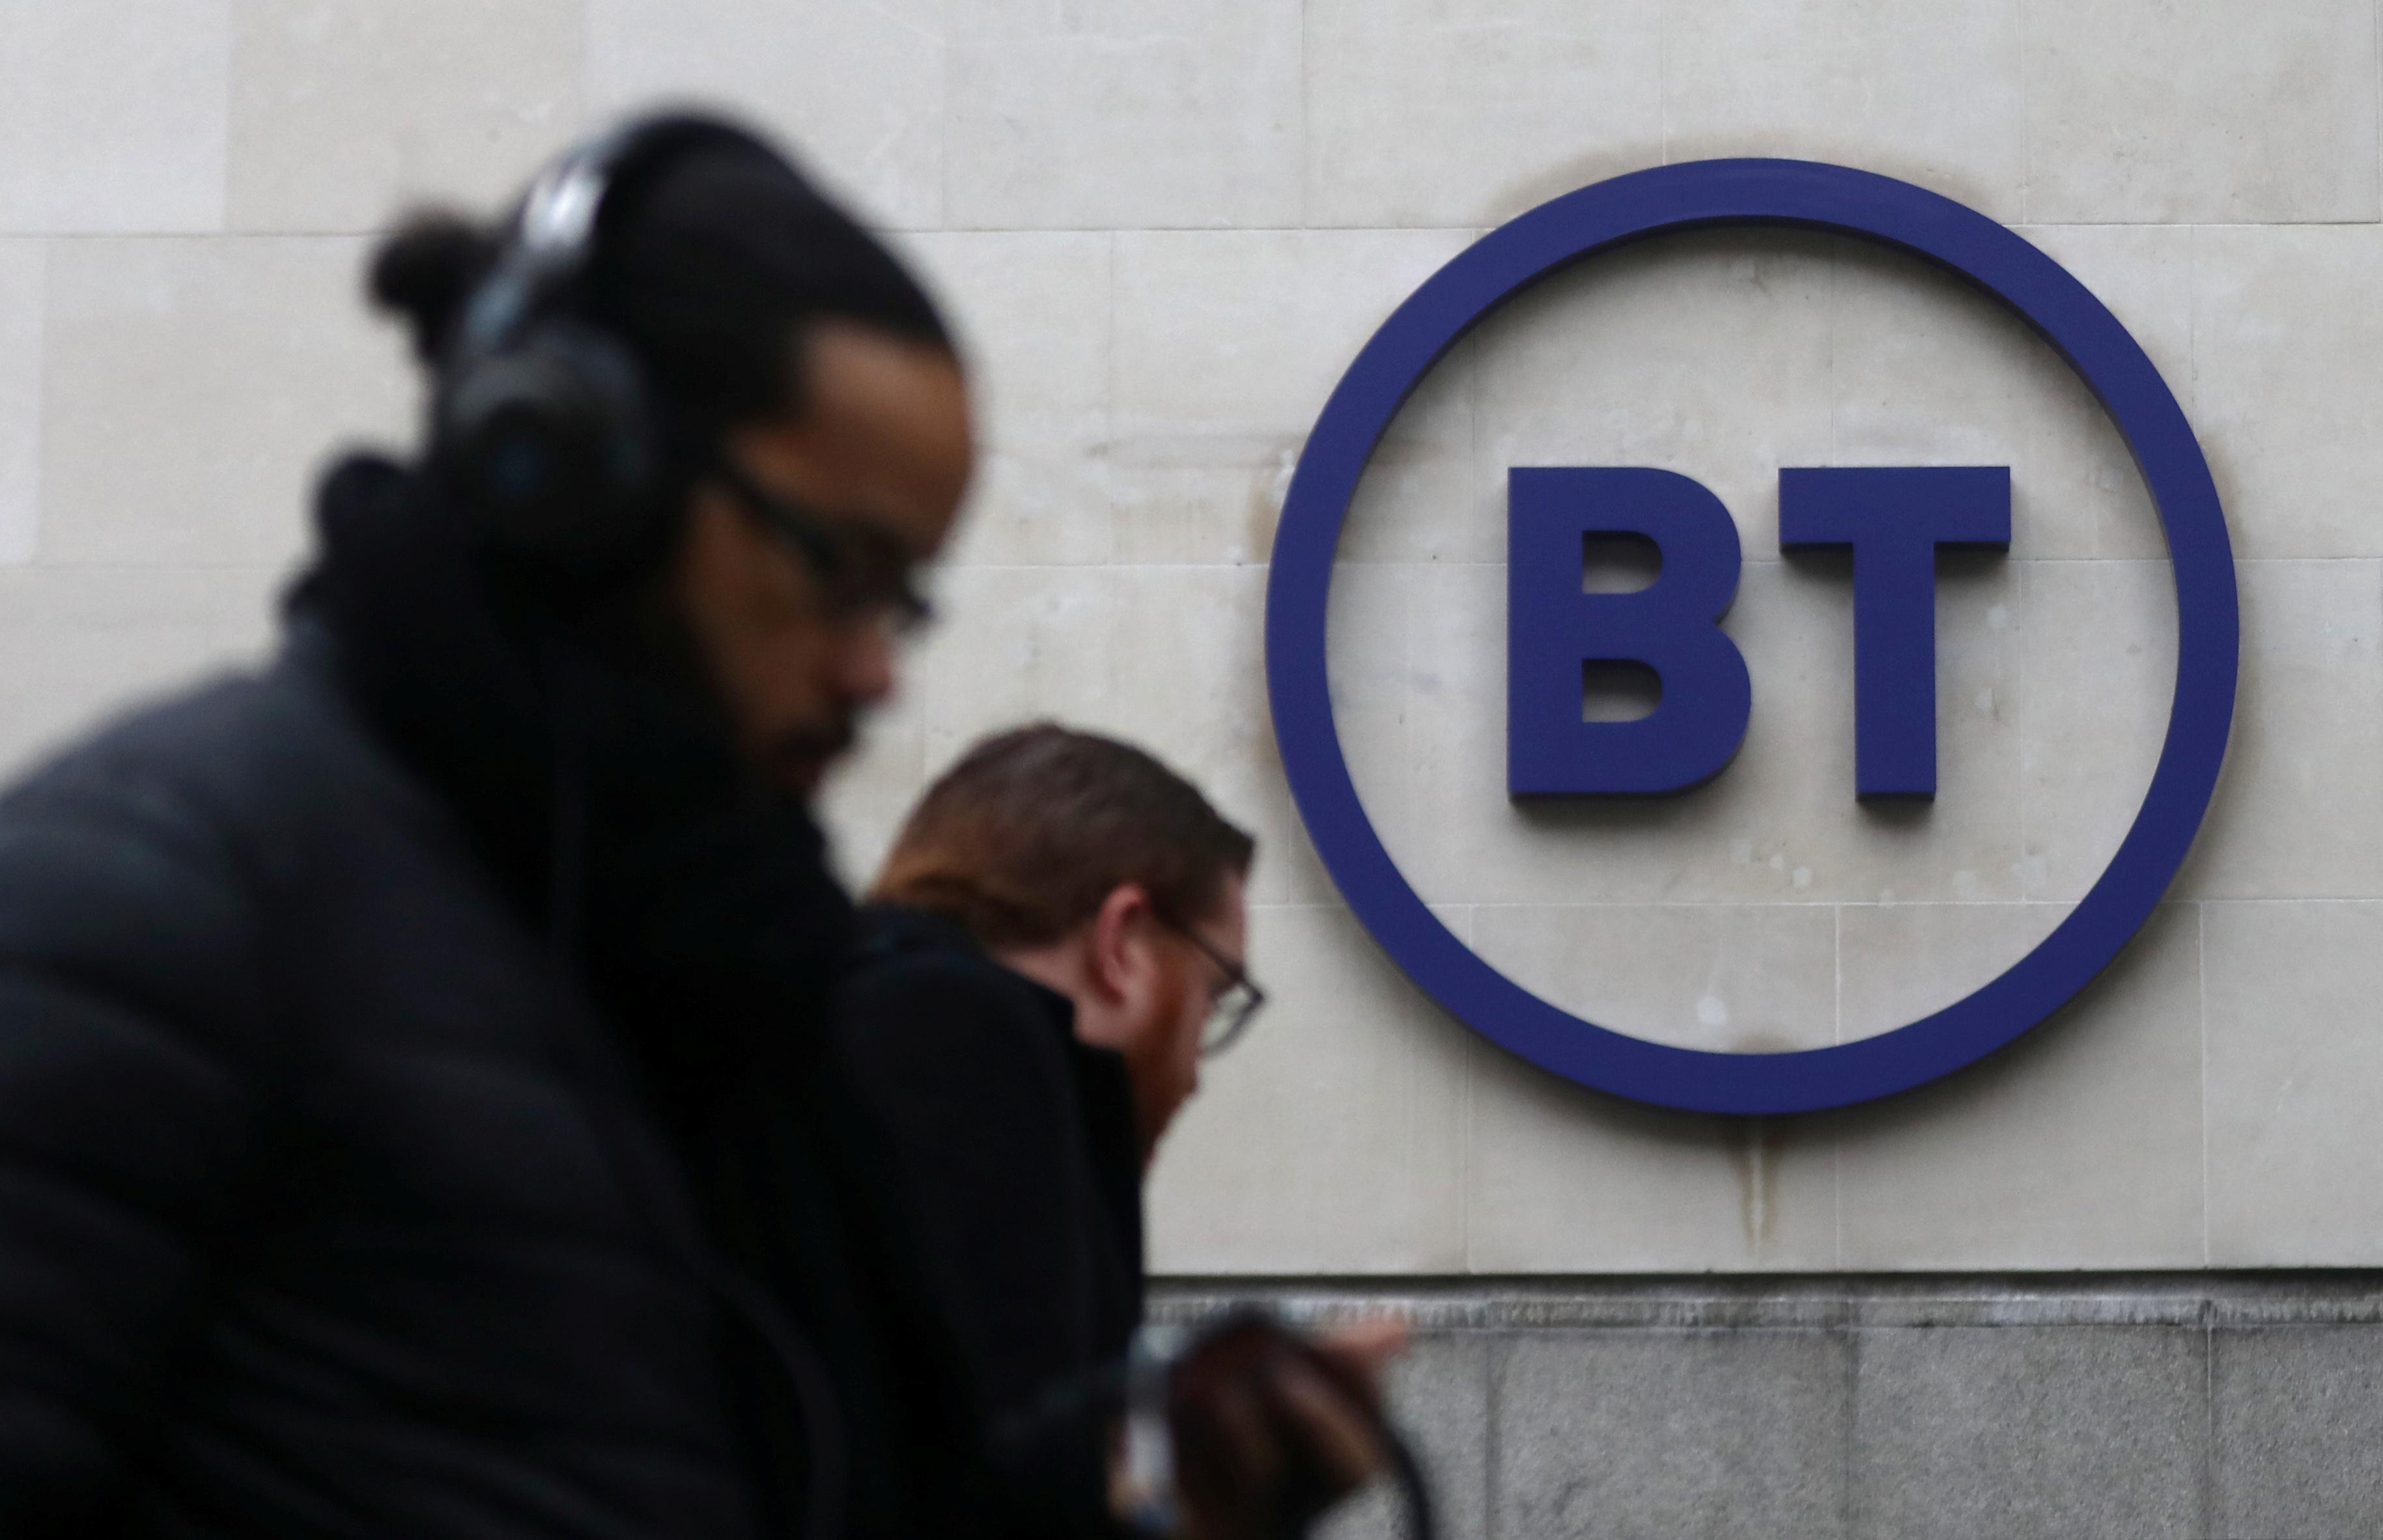 People walk past the BT headquarters in London, Britain, November 15, 2019. REUTERS/Simon Dawson